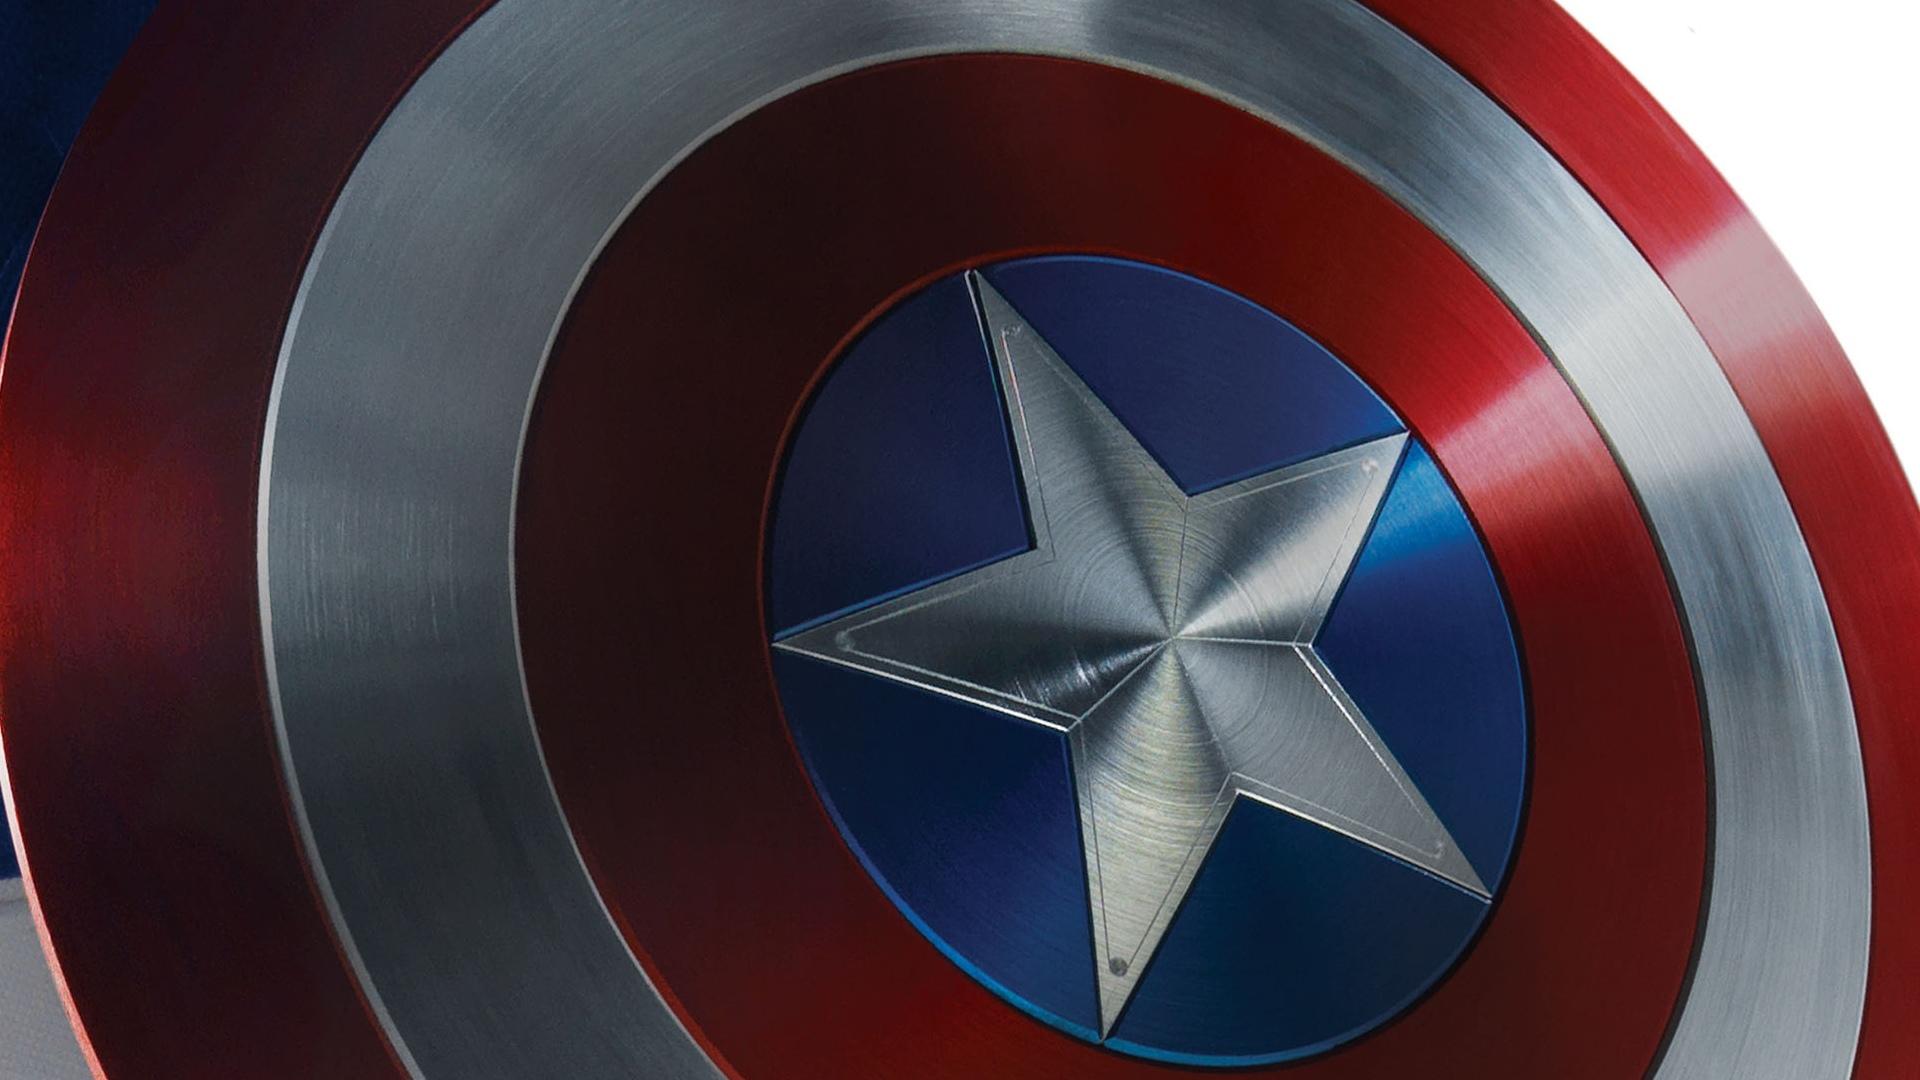 Captain-America-Shield-Photo-for-Desktop-Background-1920x1080-px-KB-wallpaper-wp3803626